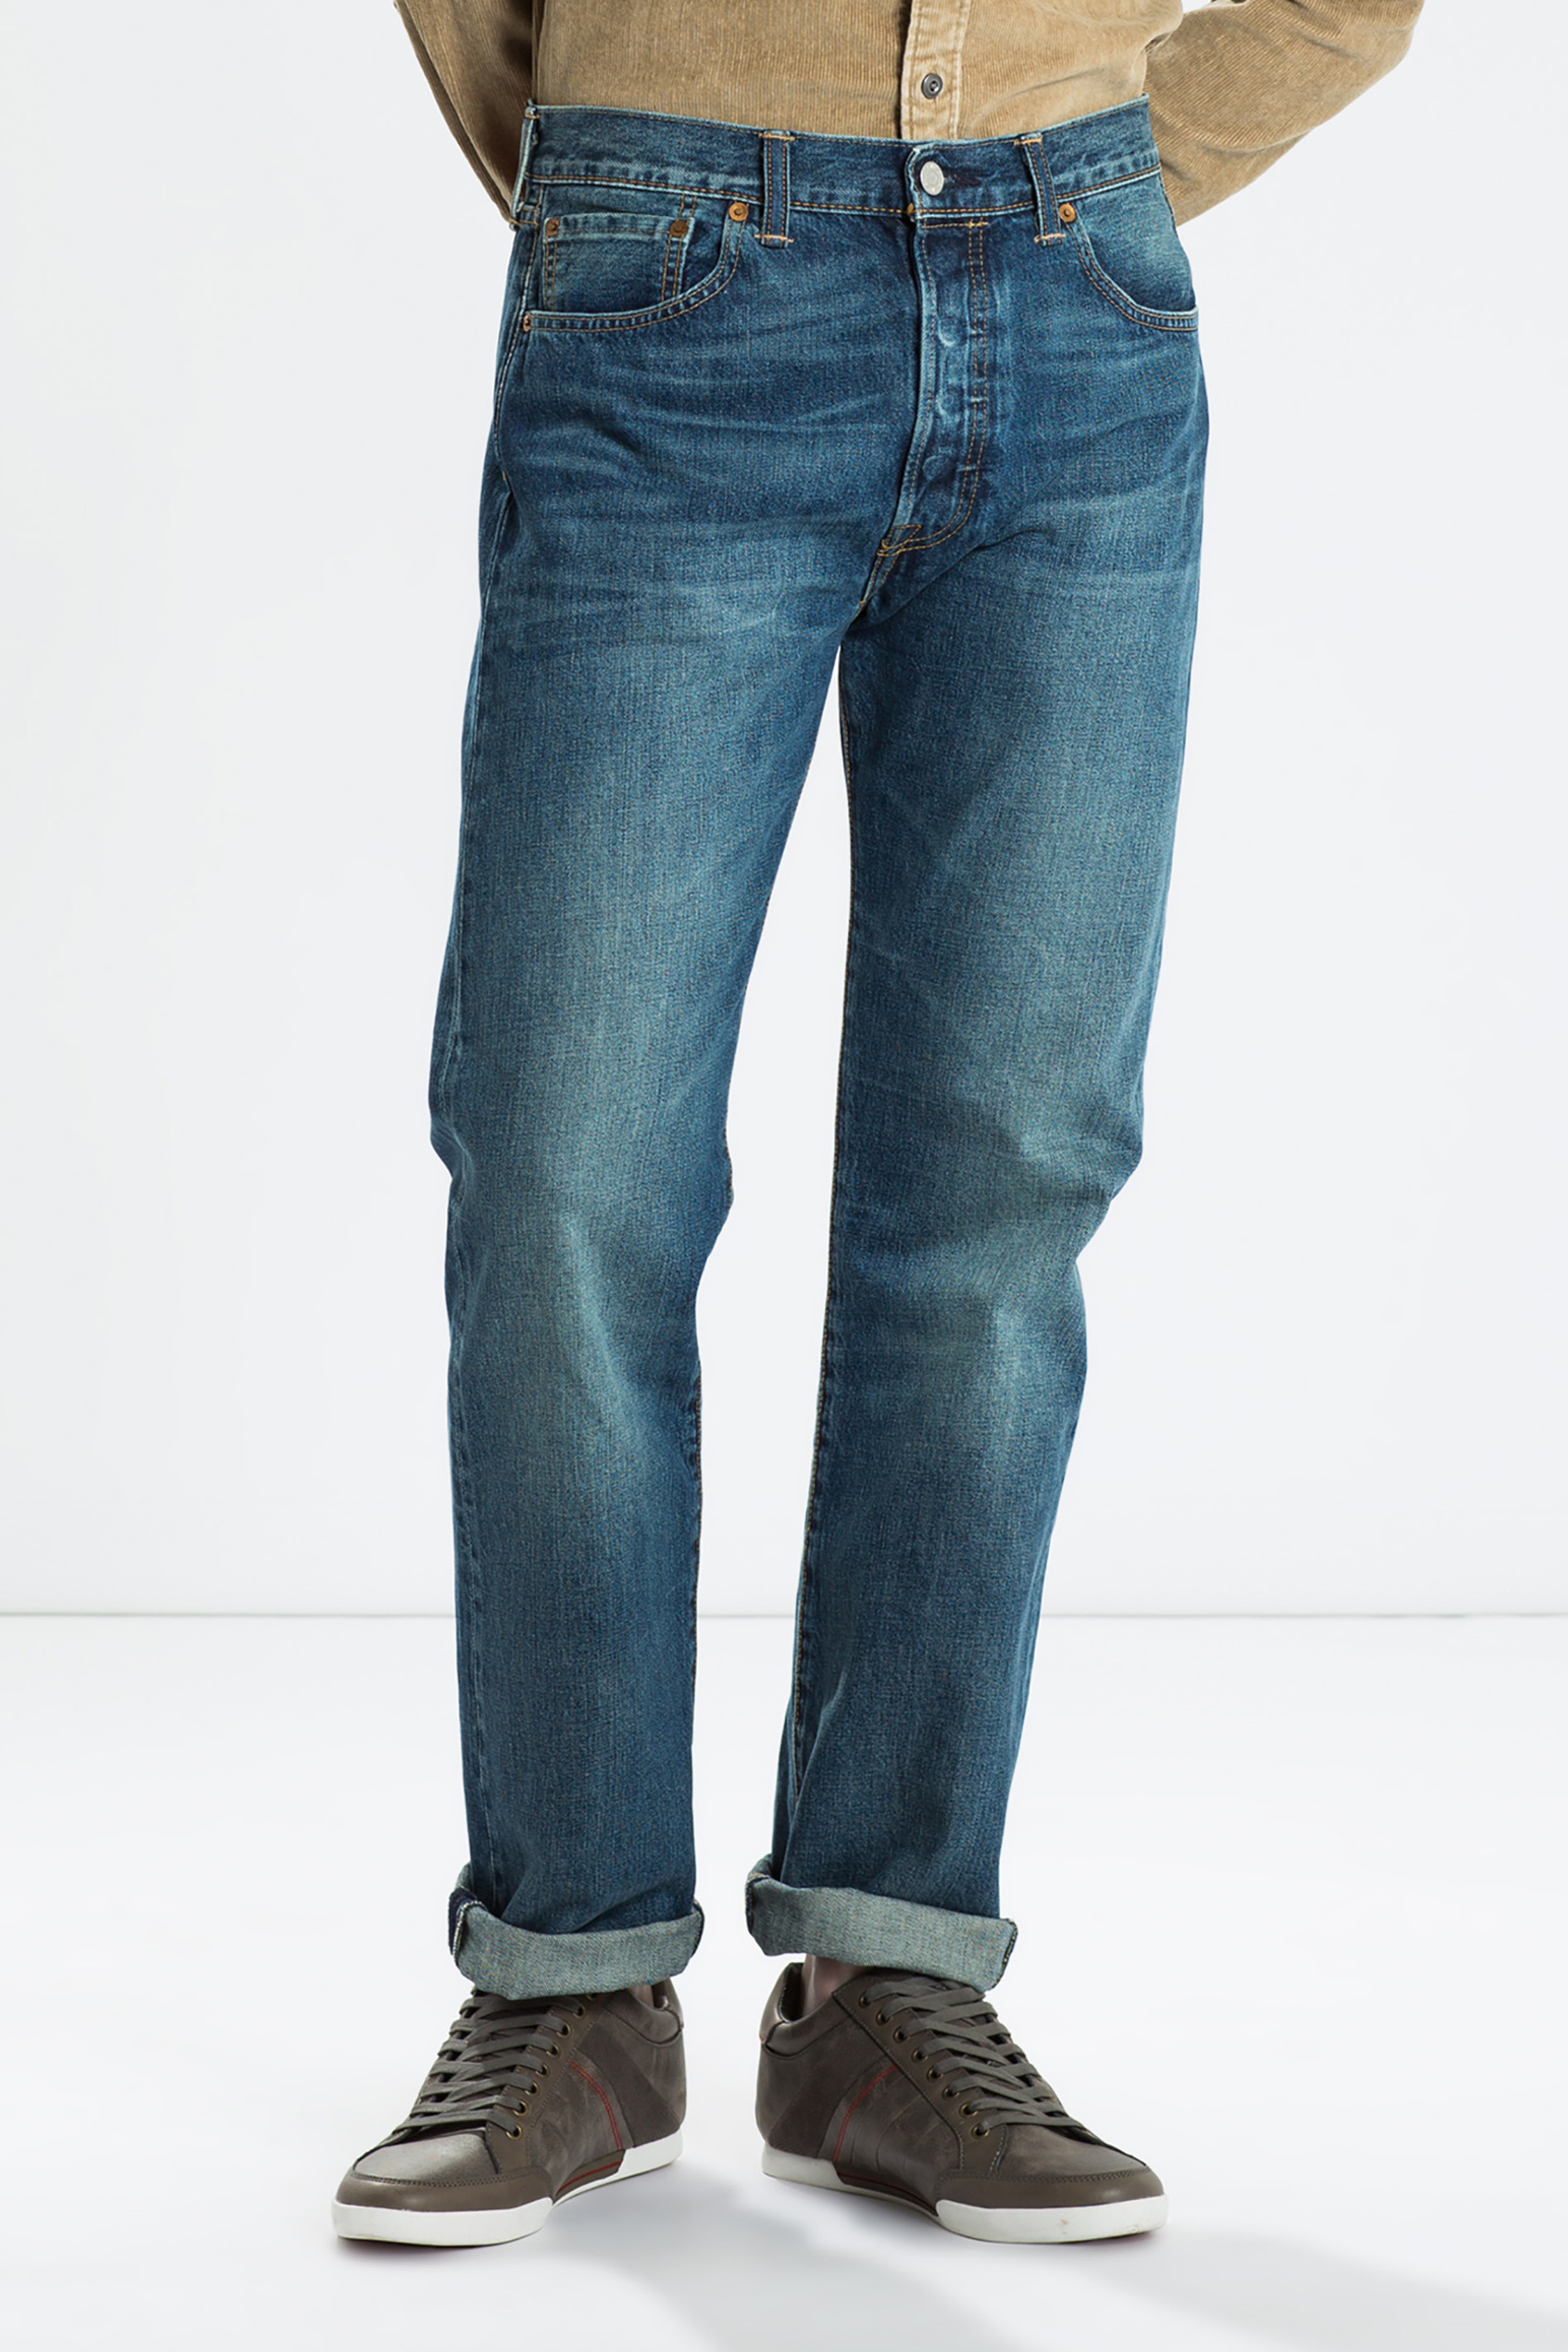 Levi's Jeans 501 Original 1307 Hook foto 4